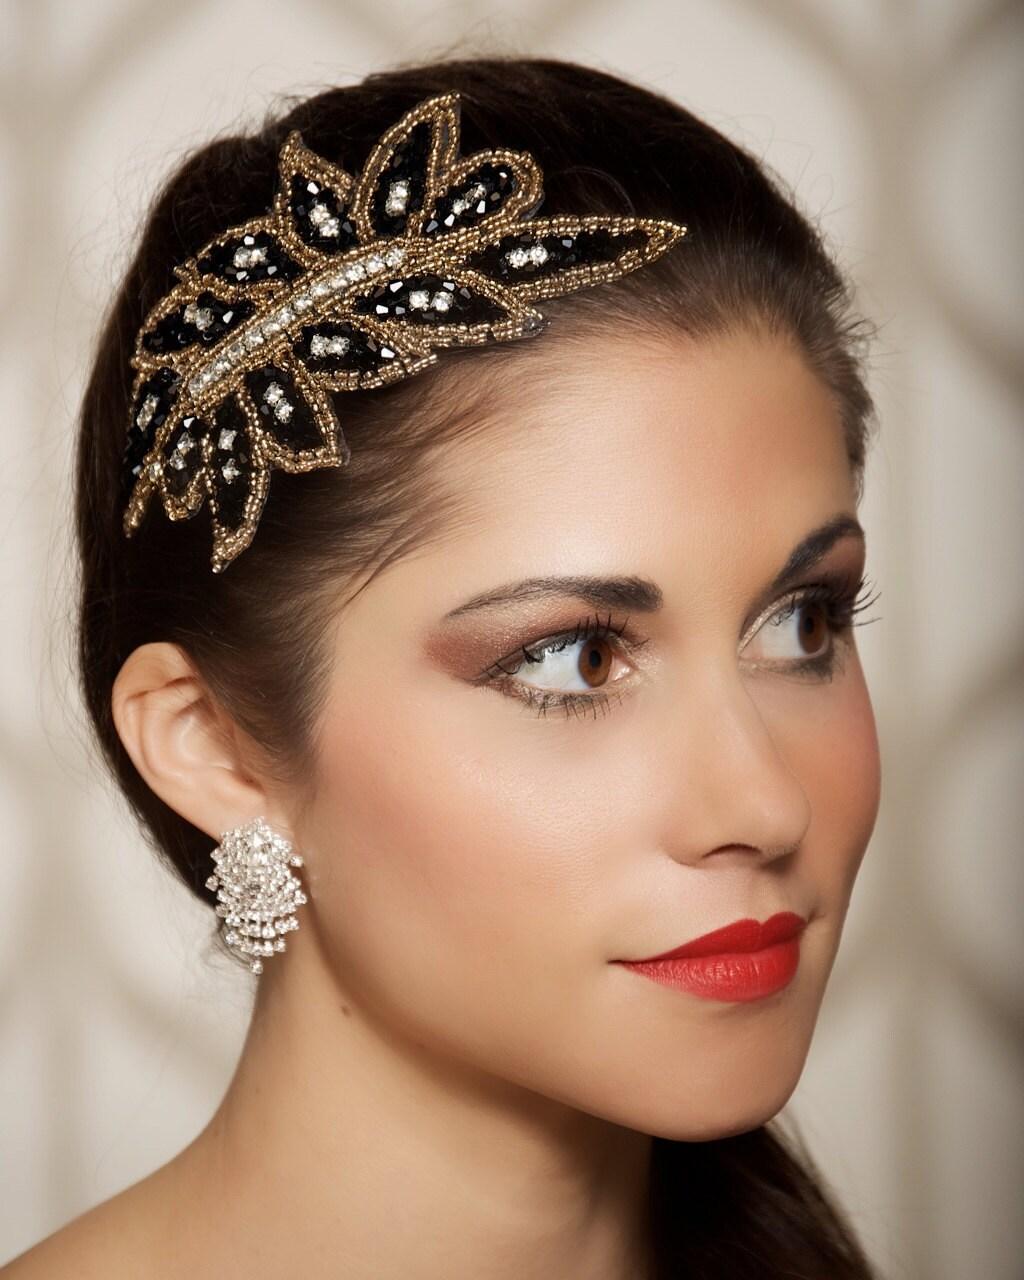 Crystal Wedding Headpieces: Gastby Party Headpiece Black Art Deco Hair By GildedShadows